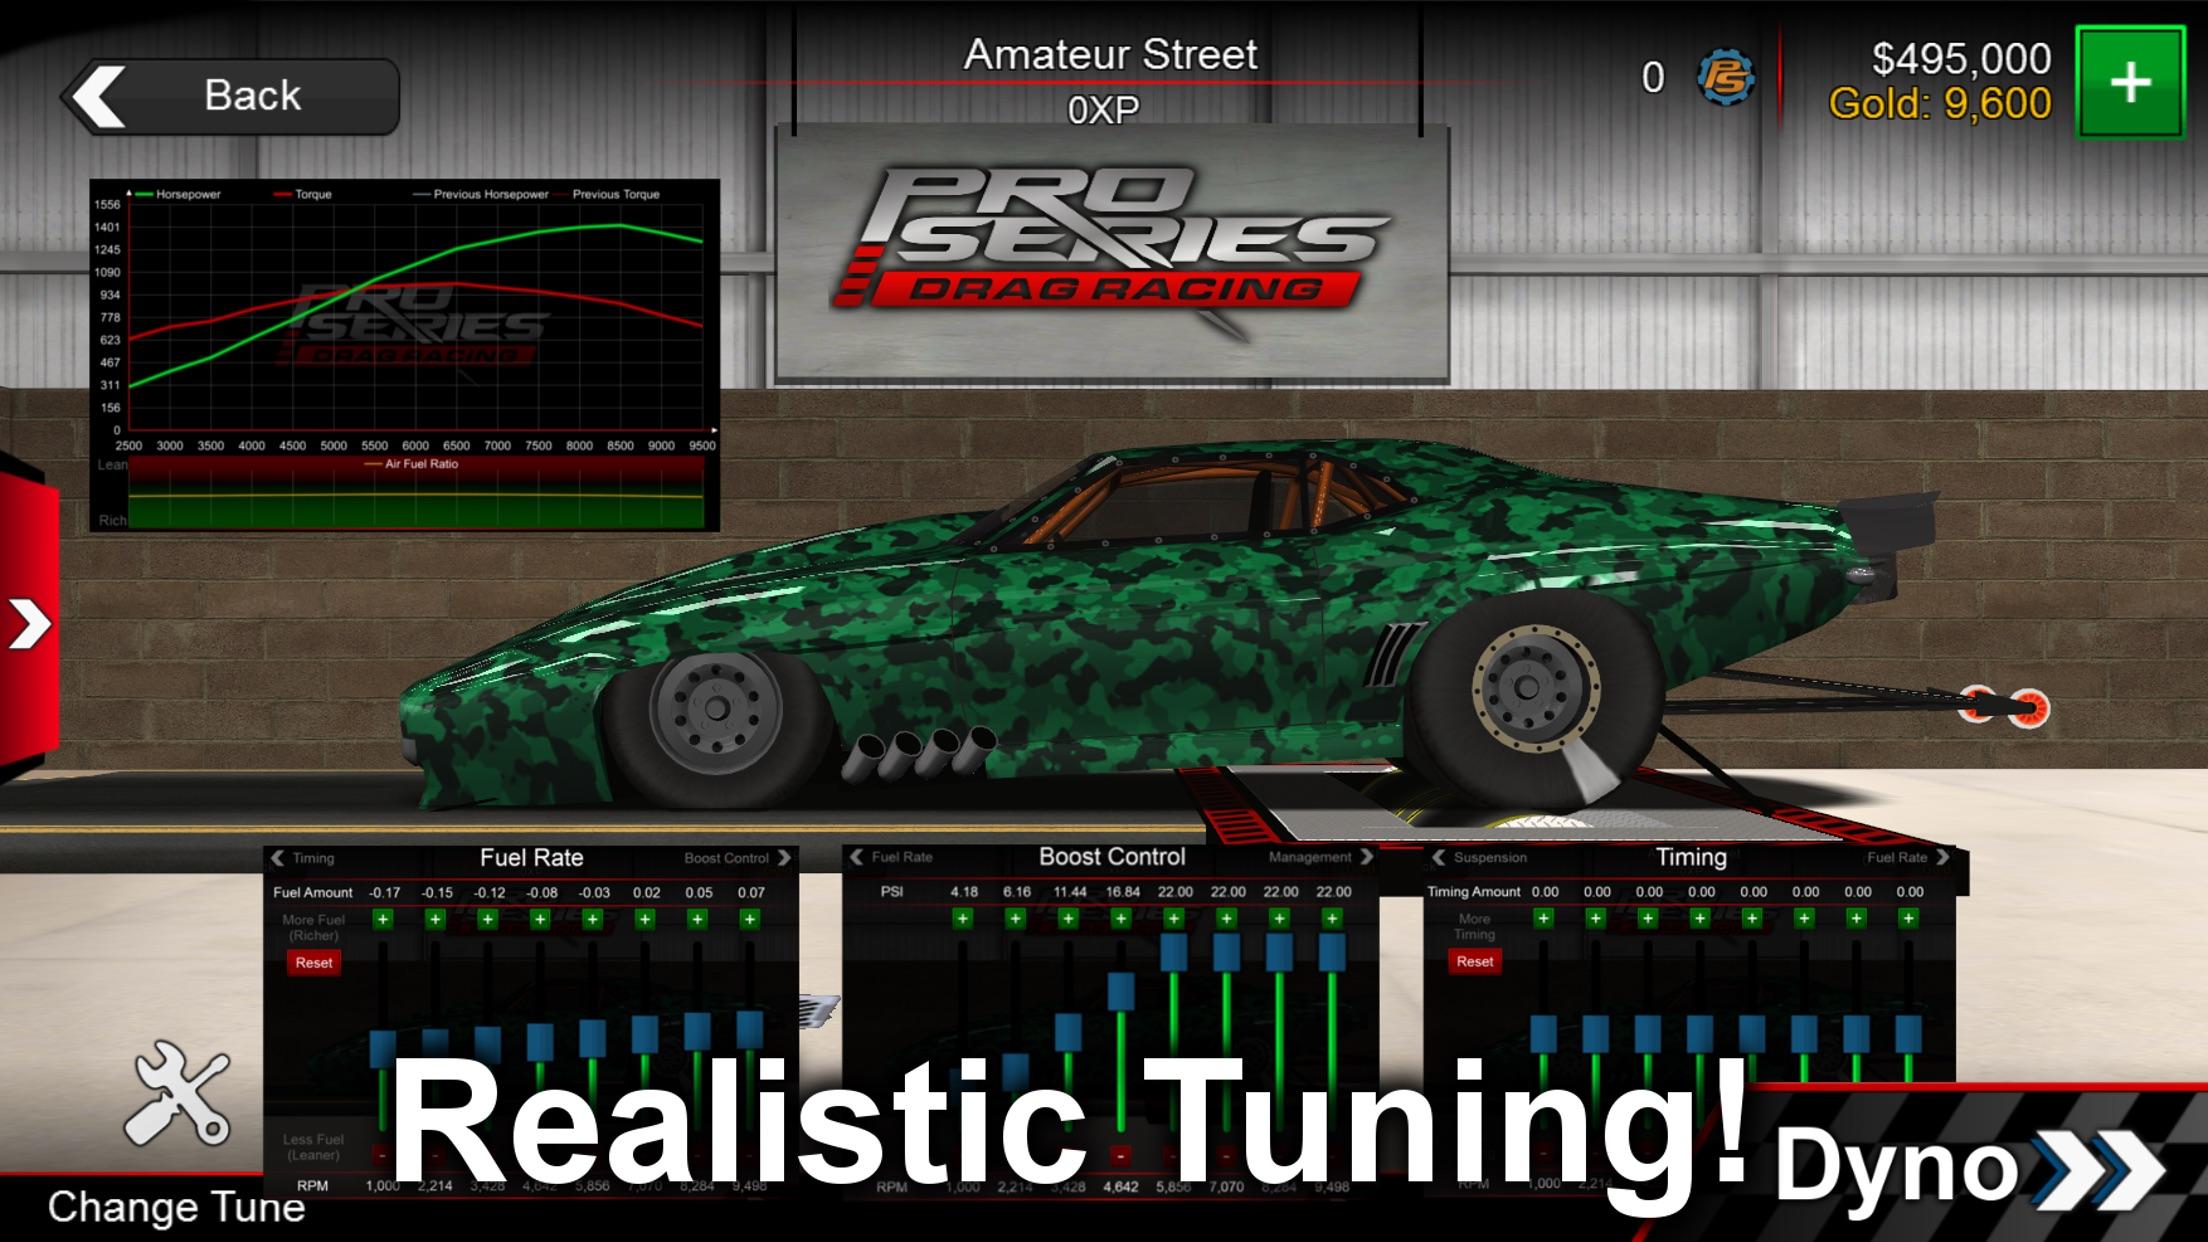 Pro Series Drag Racing Screenshot